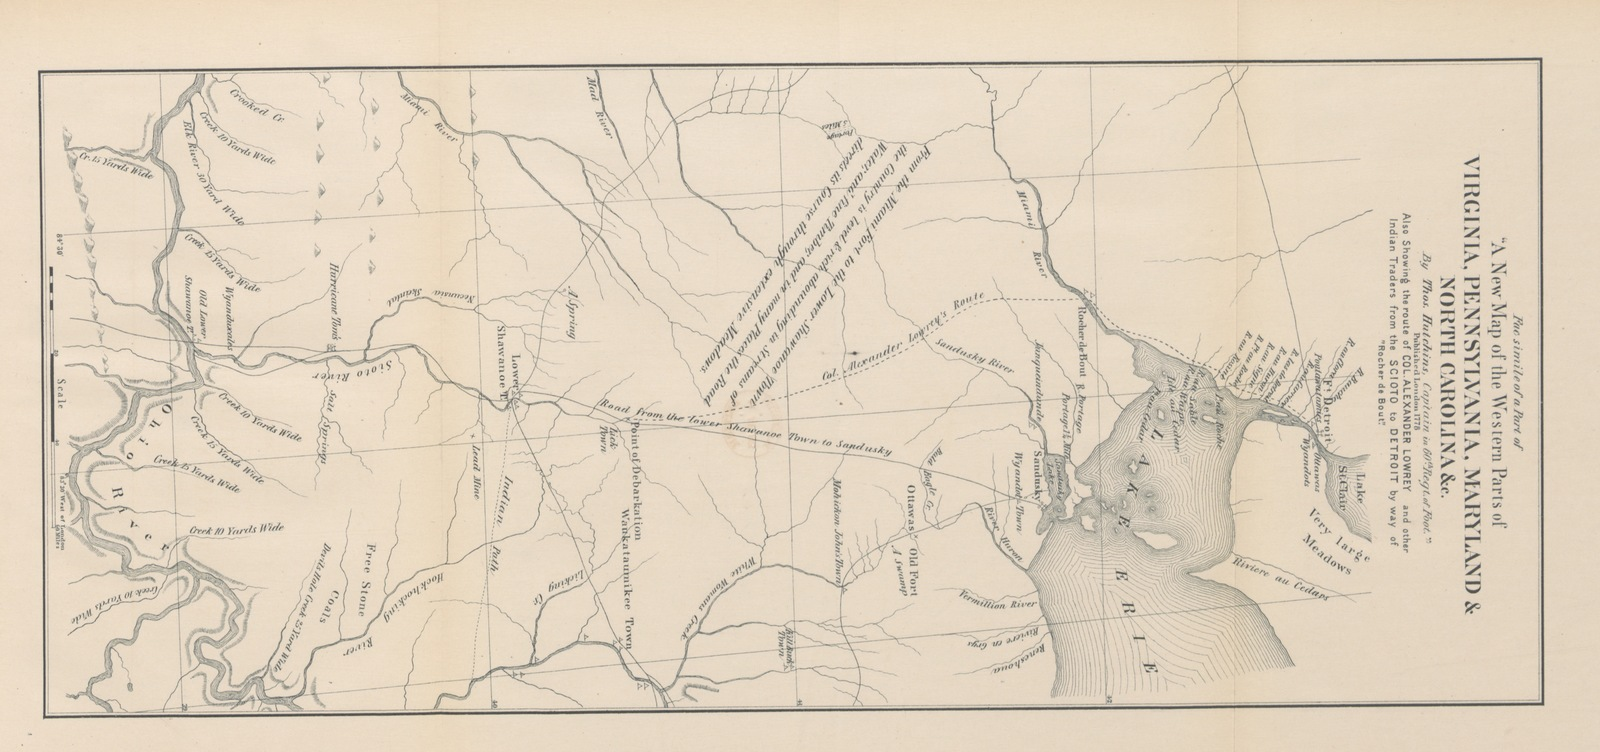 Irvine Maps on